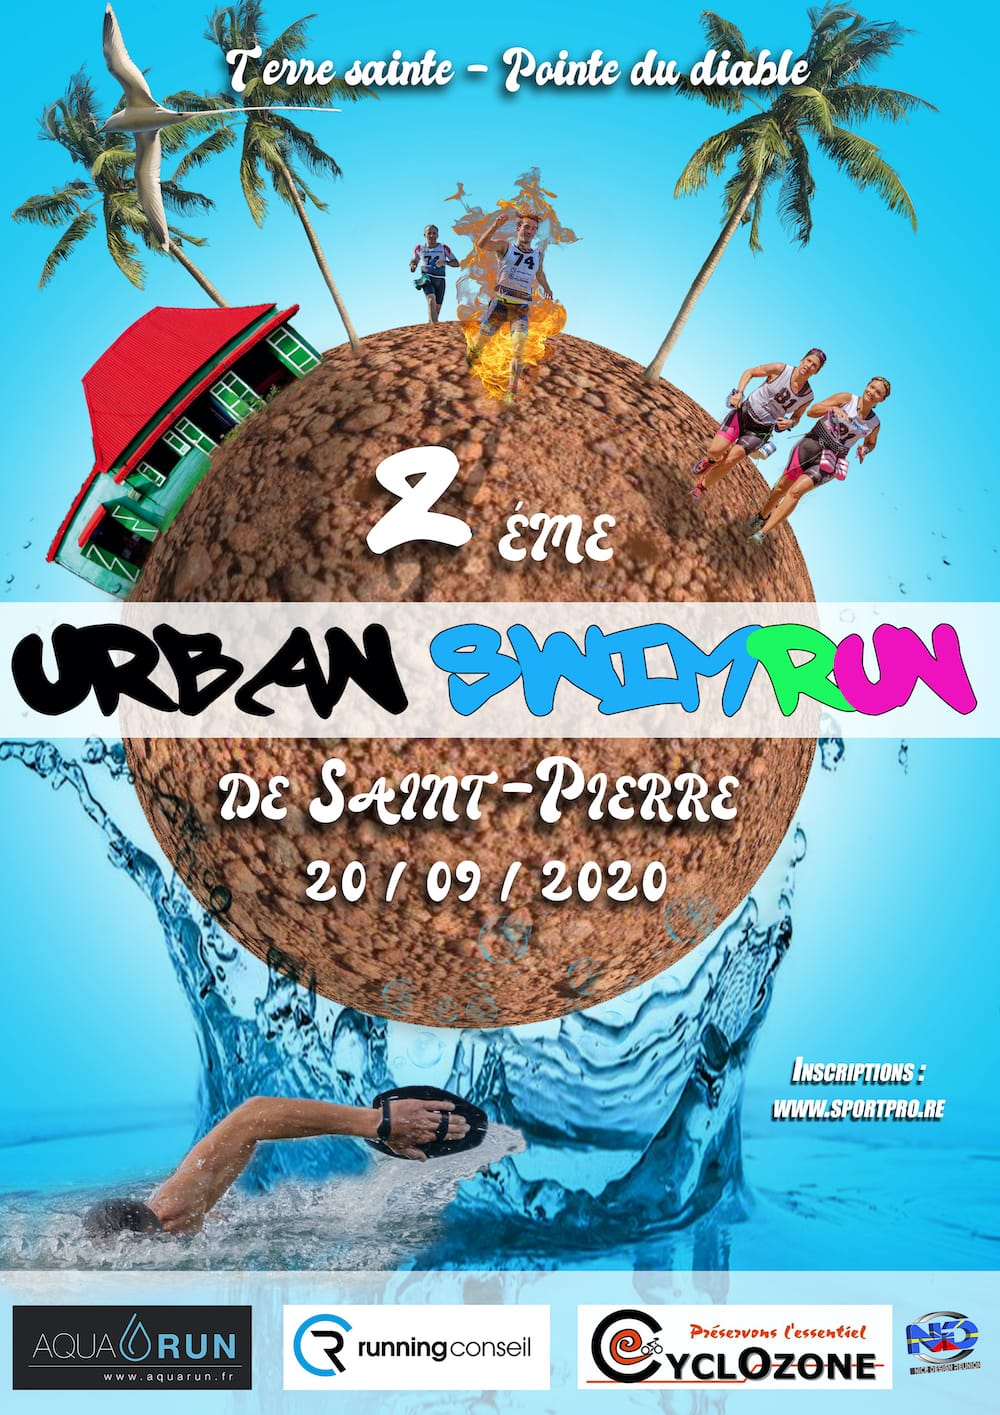 Affiche-Urban-Swimrun-2020